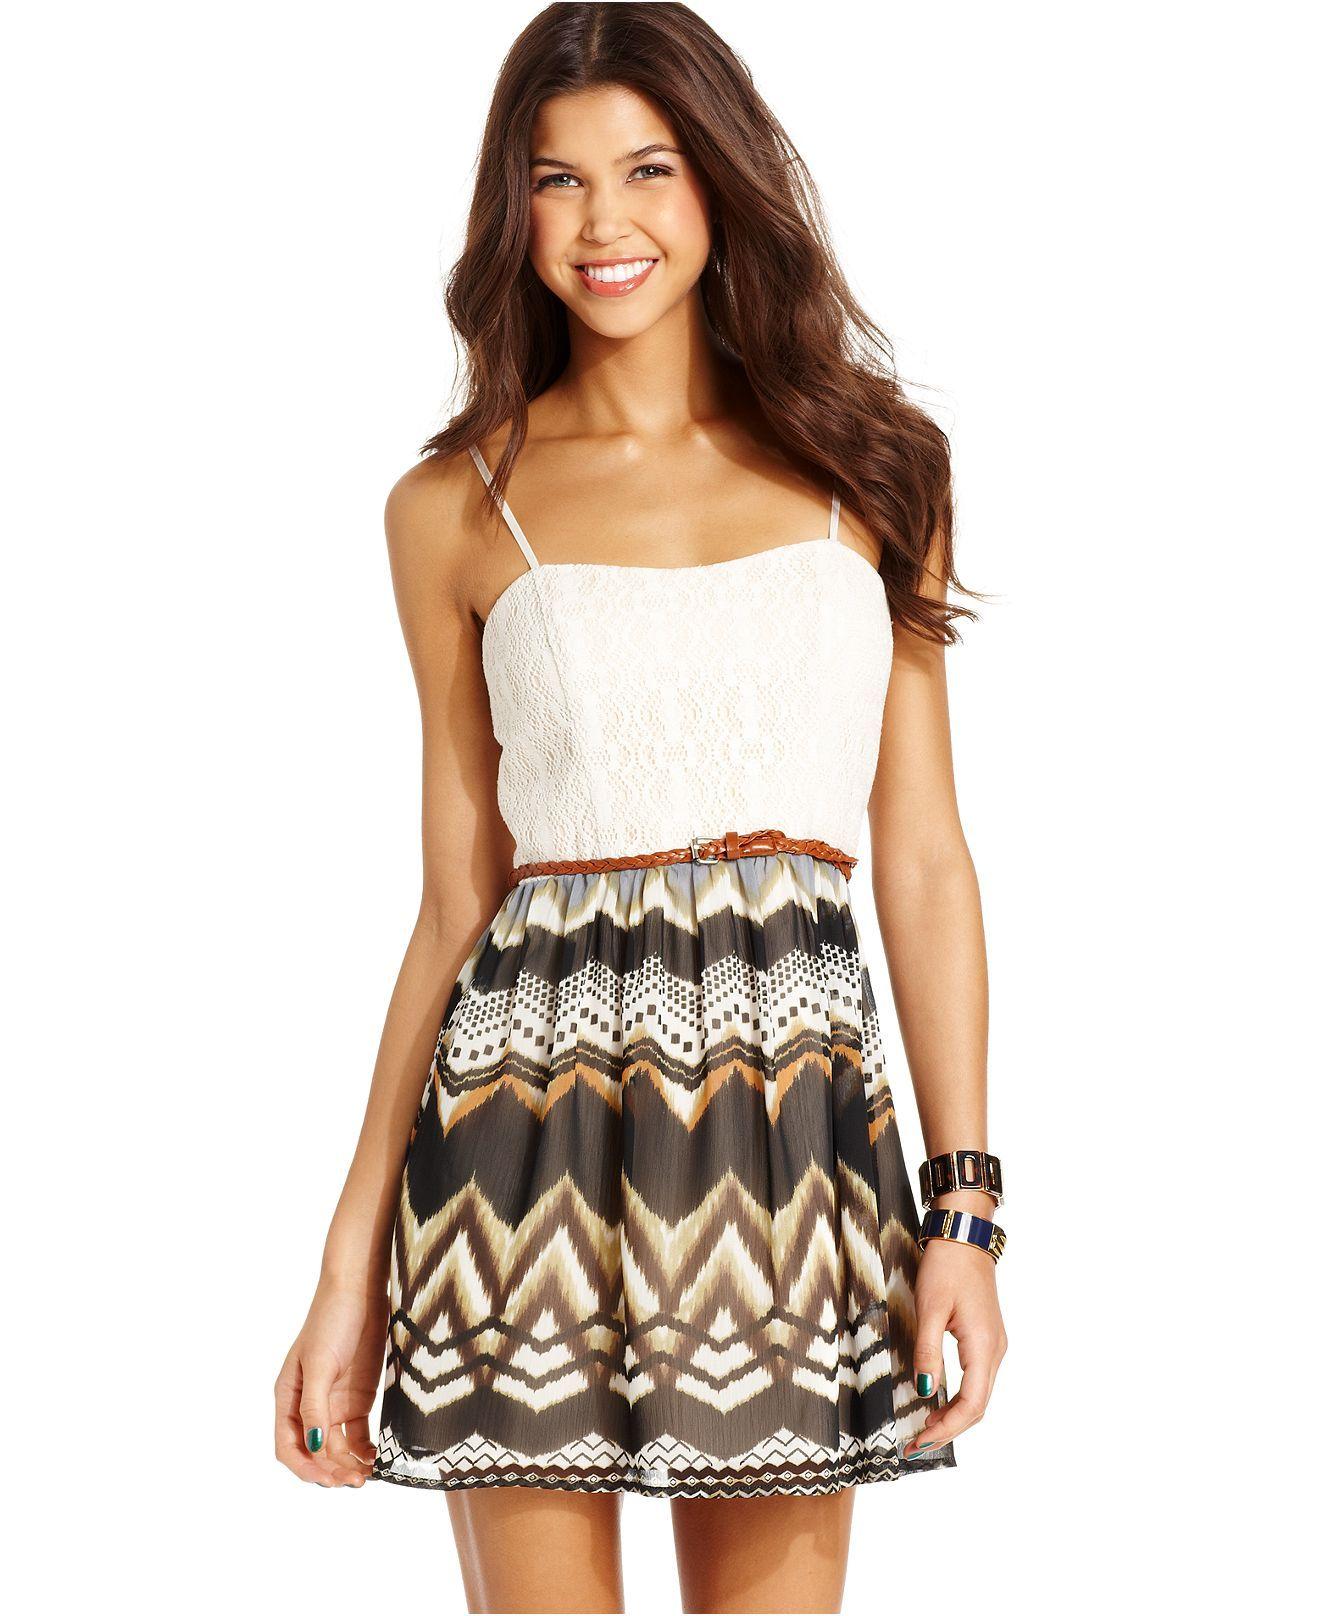 White apron macy's - Party Dresses